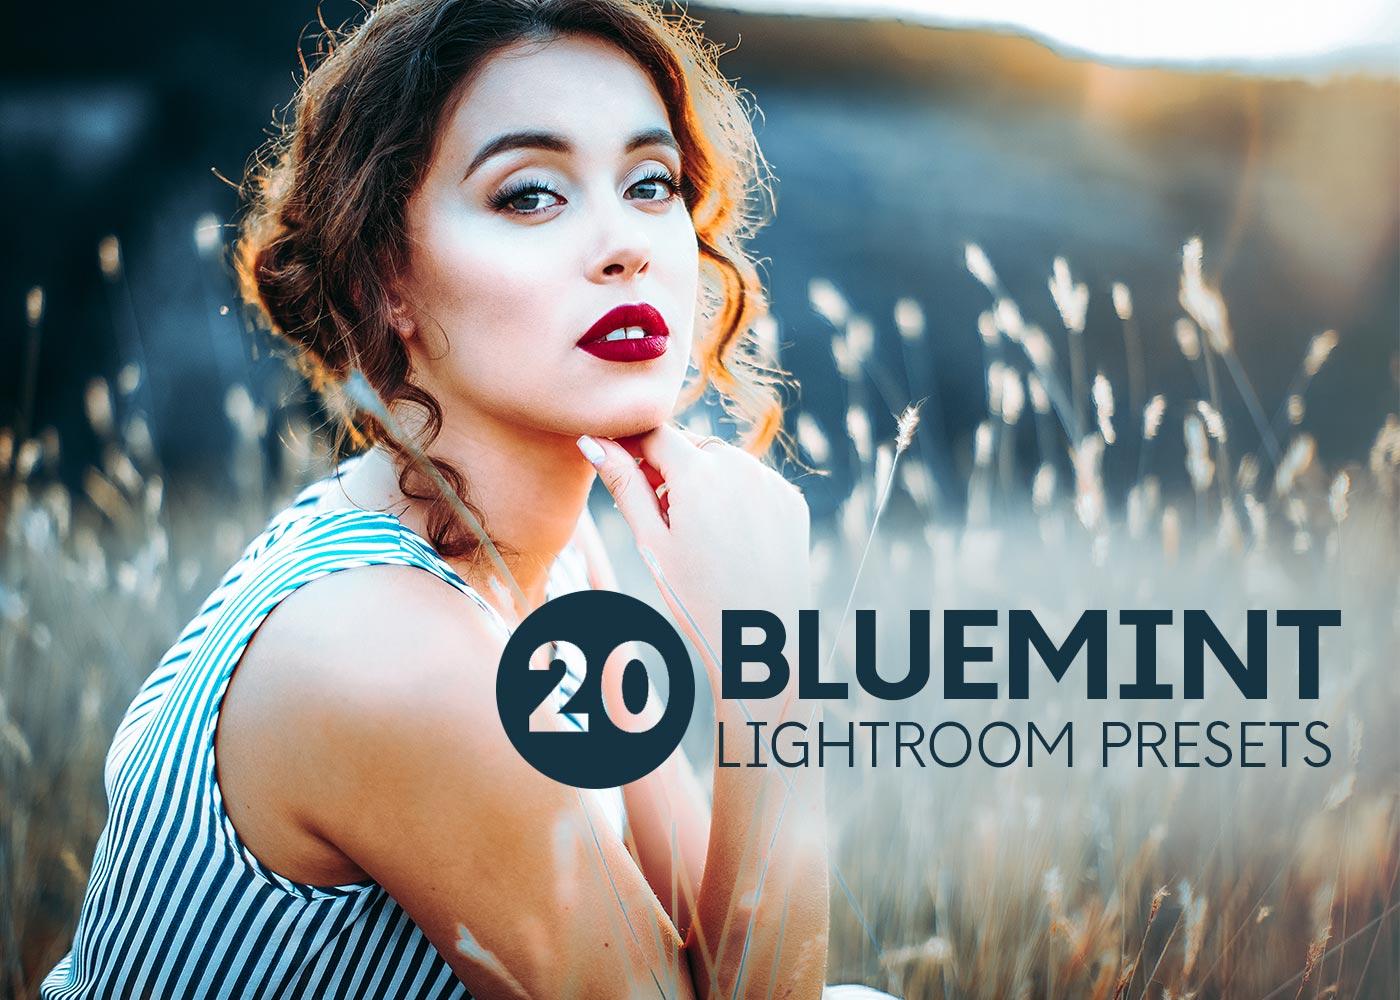 lightroom mobile presets feature bluemint